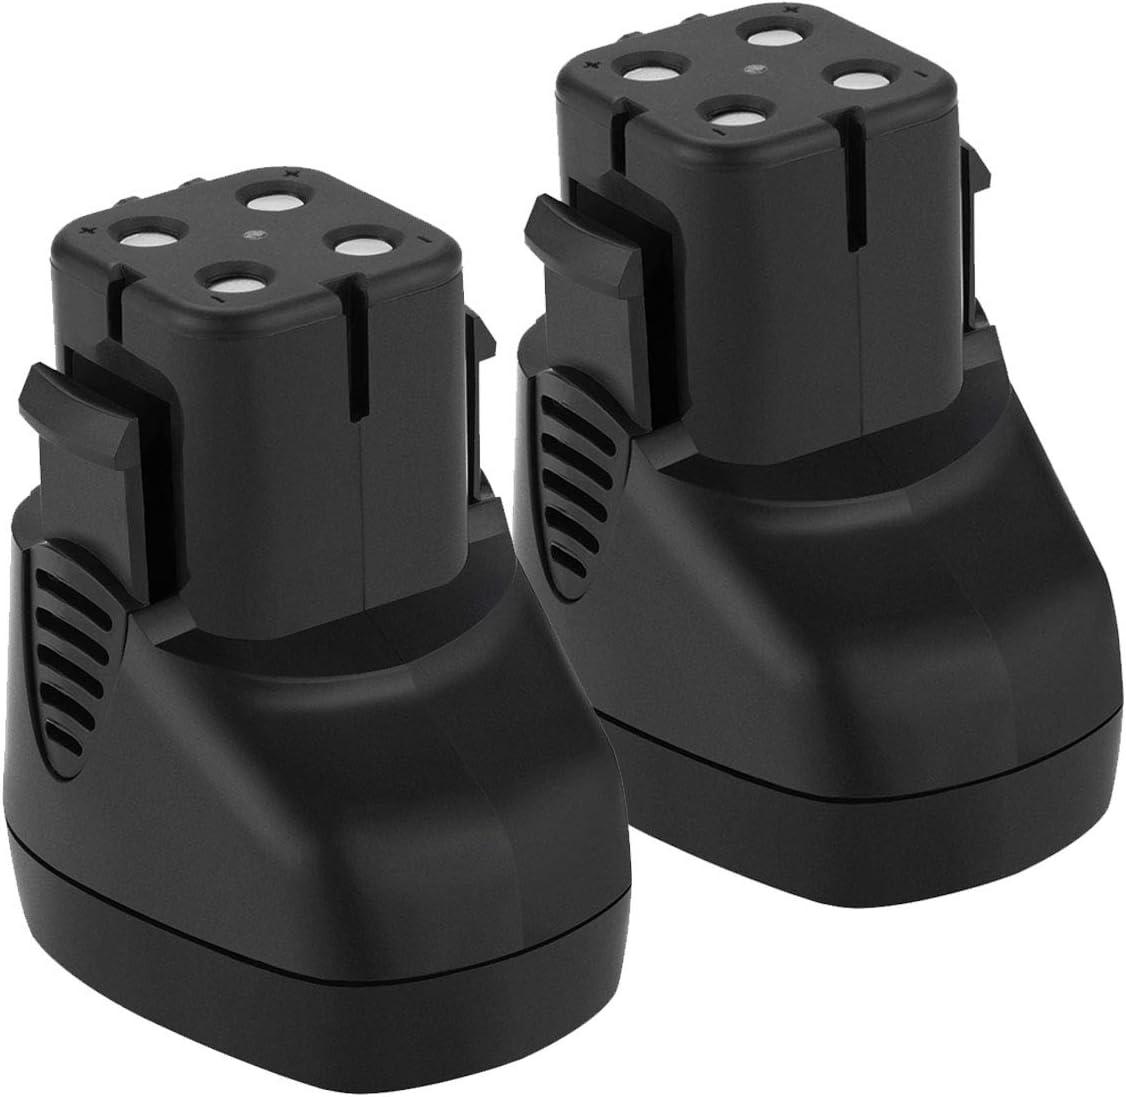 Shentec 2-Pack 3500mAh 7.2V High Capacity Replacement Battery Compatible with Dremel 757-01 Dremel 7700-01 Dremel 7700-02, 7.2V Battery (Ni-MH)